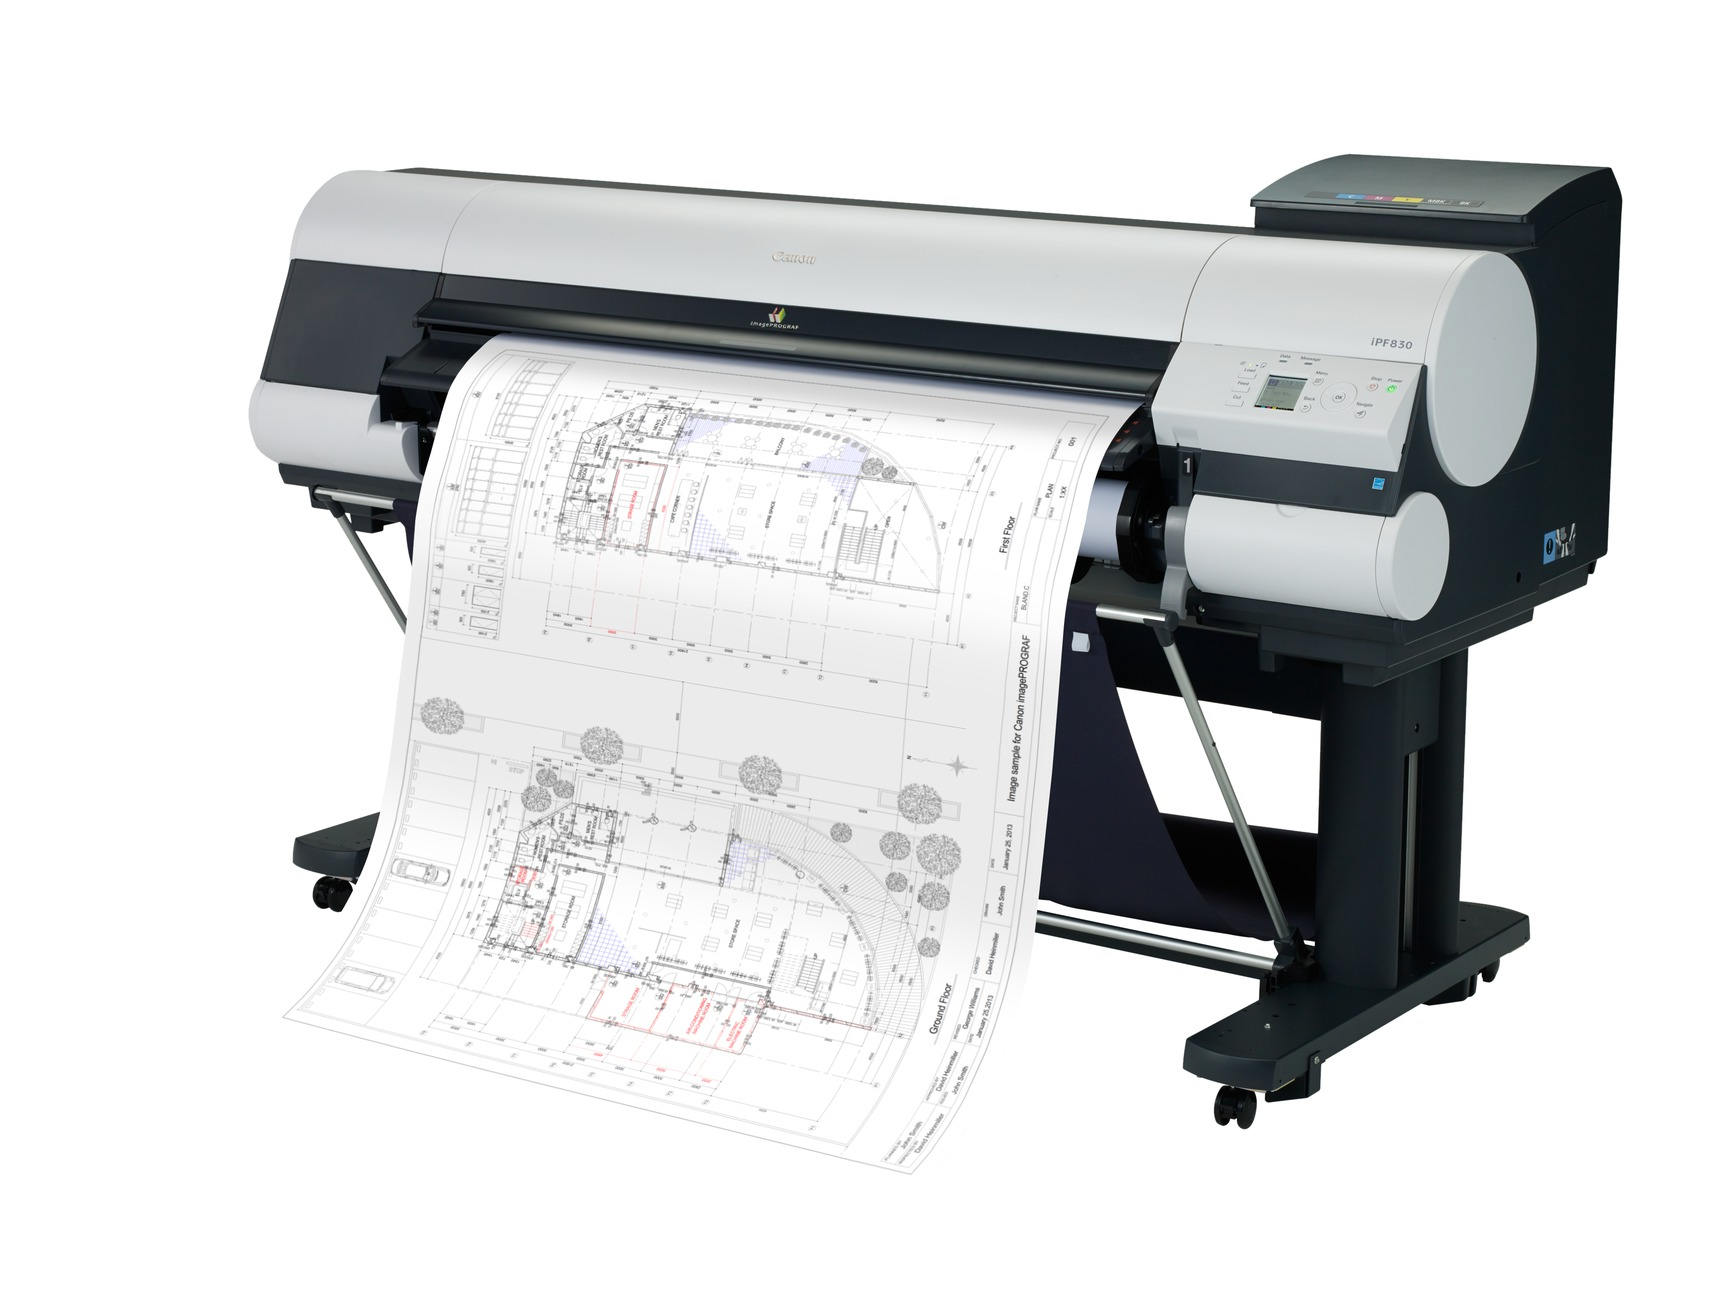 traceur-canon-ipf-830-traceurmoinscher